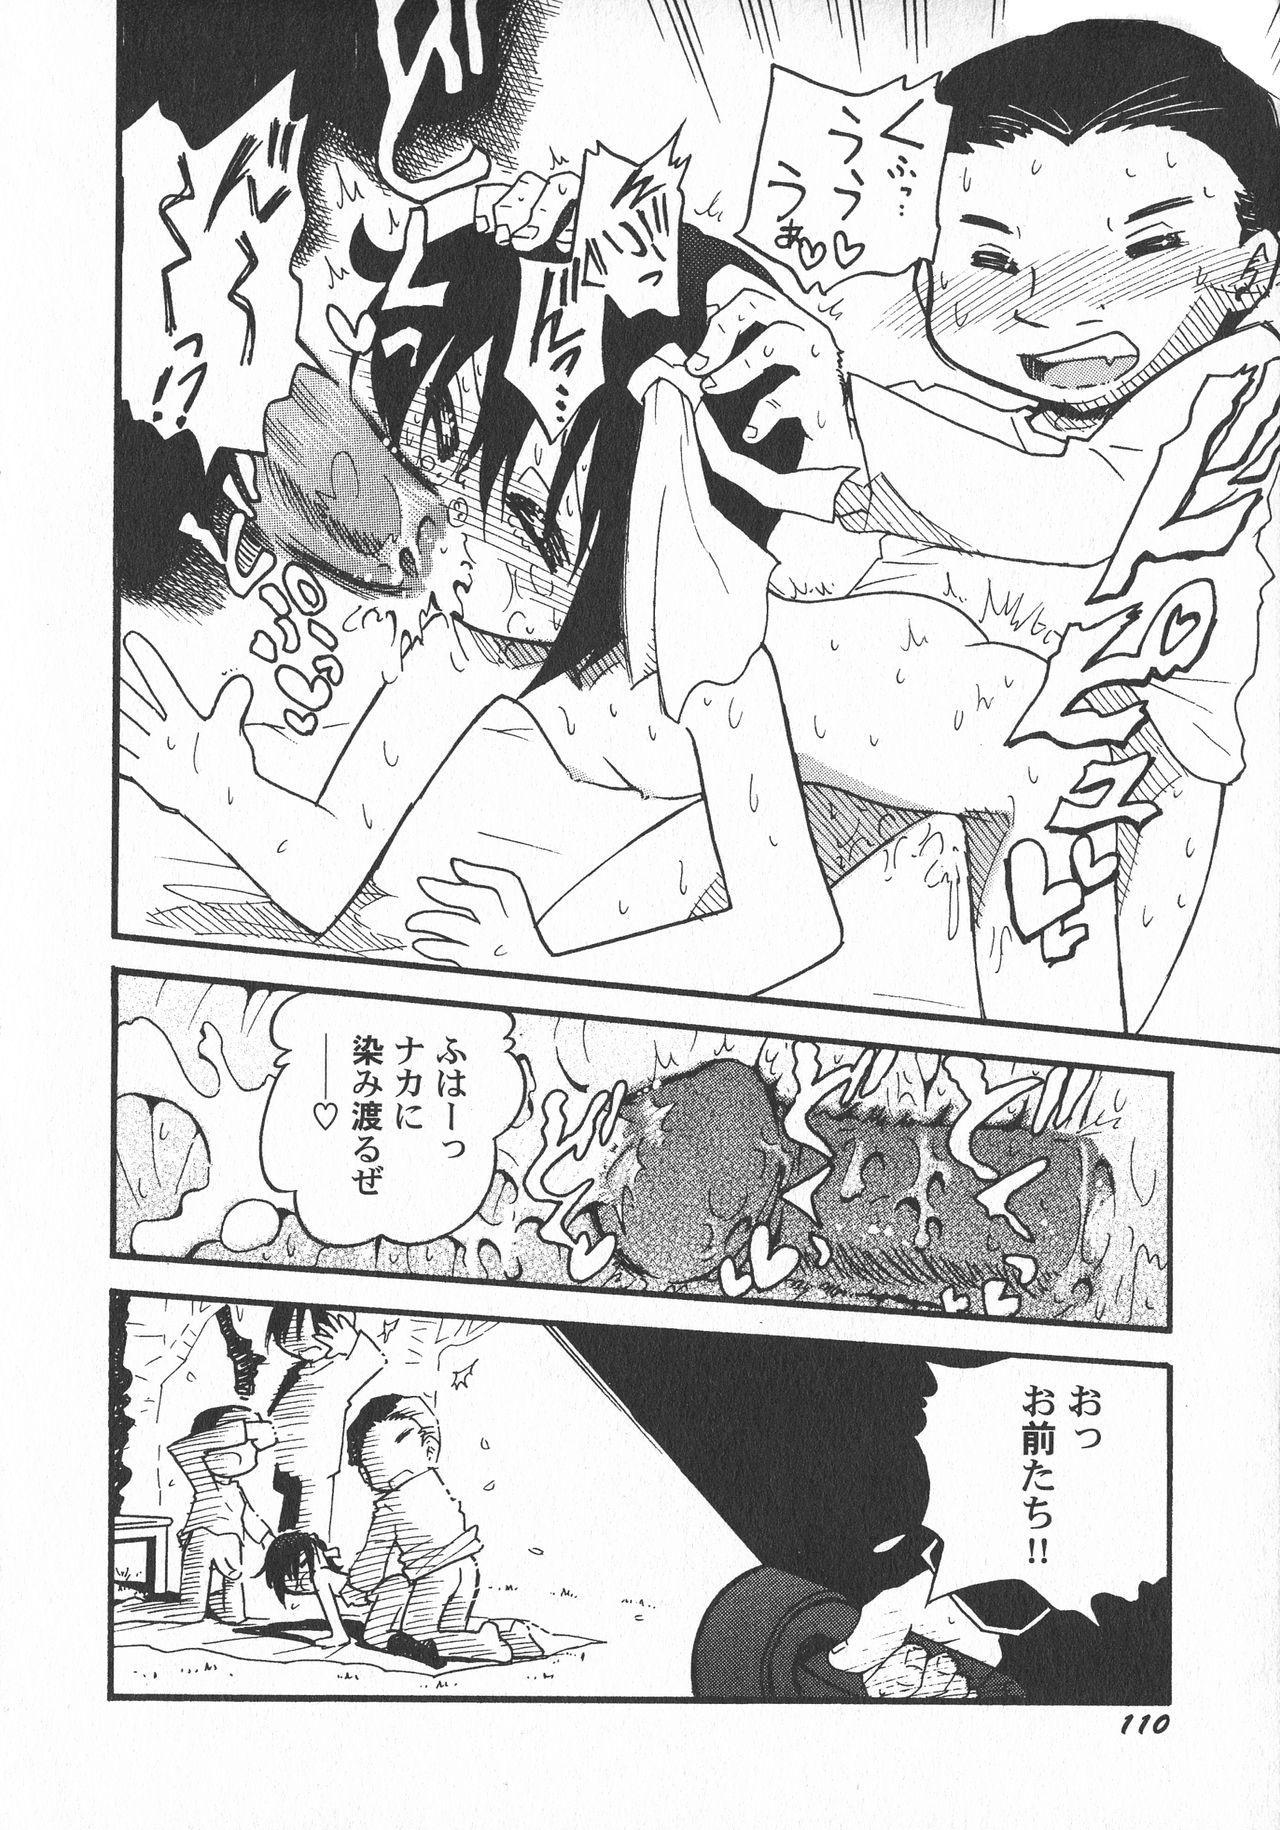 LoLiN Ameiro no Tokigo 111